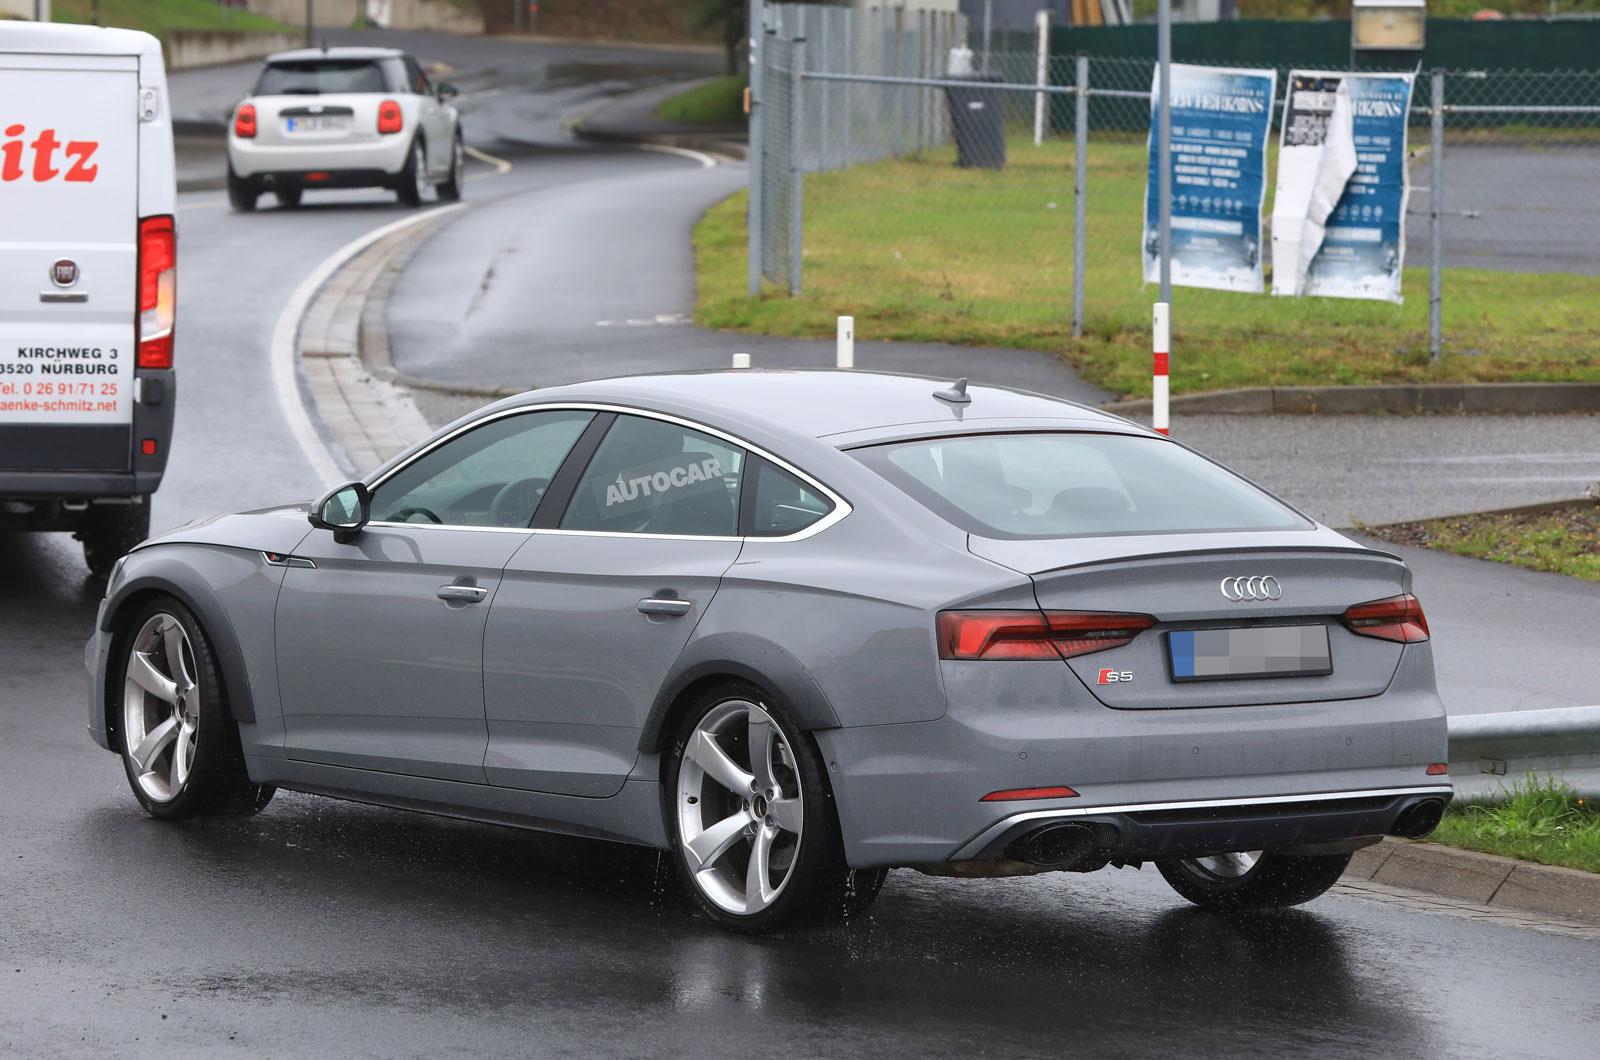 444bhp Twin Turbo V6 Powered Audi Rs5 Sportback Seen Testing Autocar